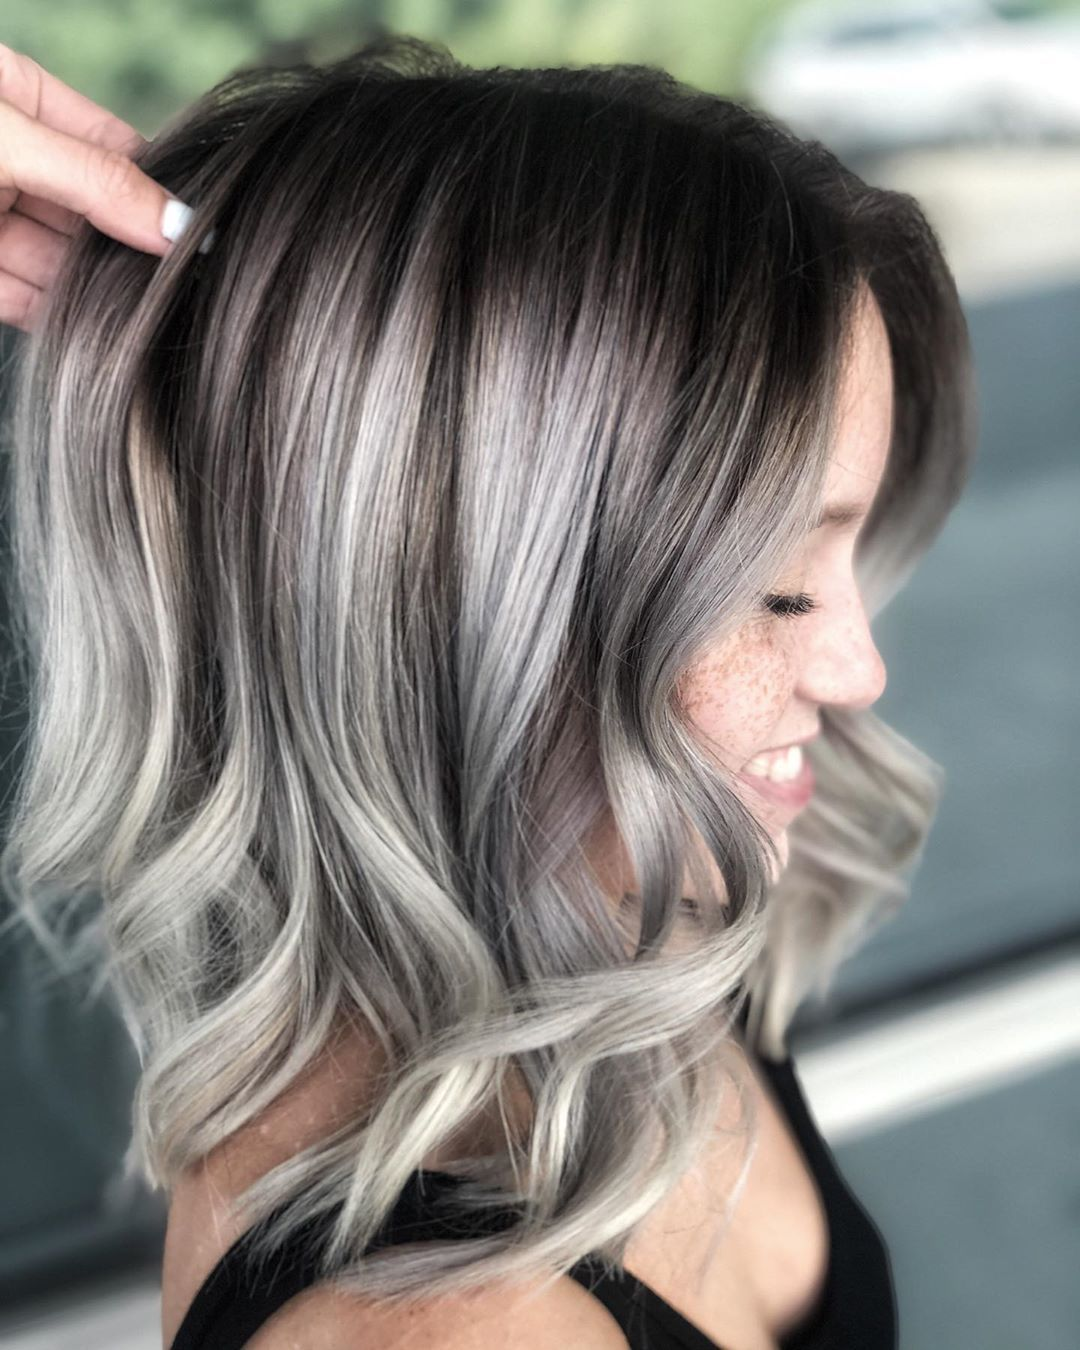 40 Silver Hair Color Ideas Trends Highlights Styles And More Silver Hair Color Silver Hair Highlights Blending Gray Hair